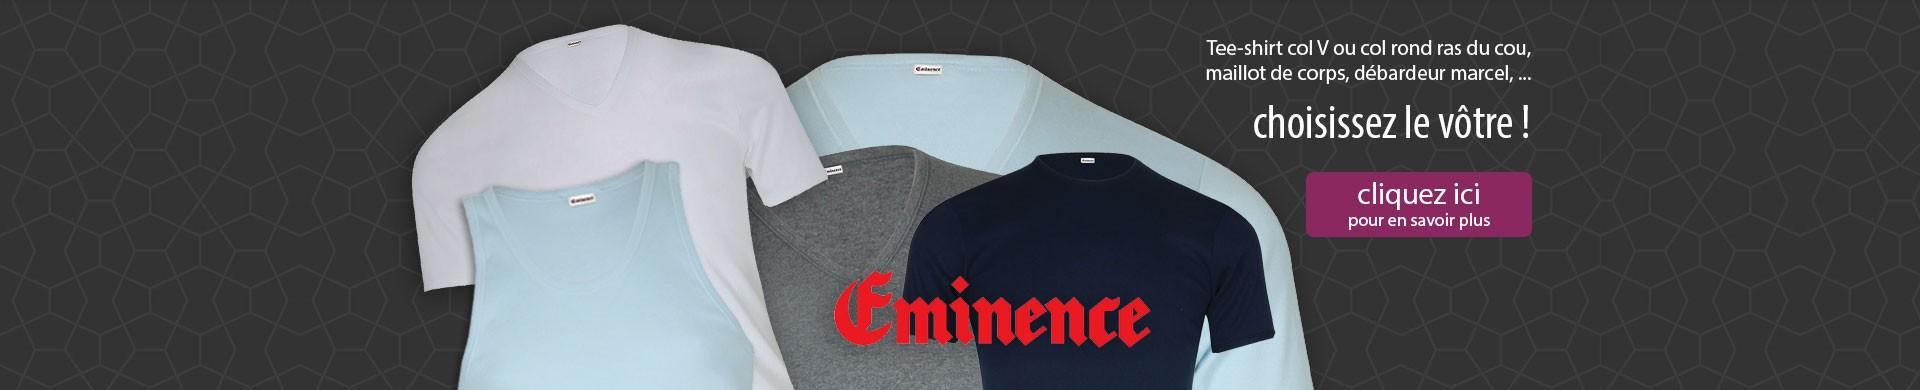 Choisissez votre Tee-shirt Eminence !